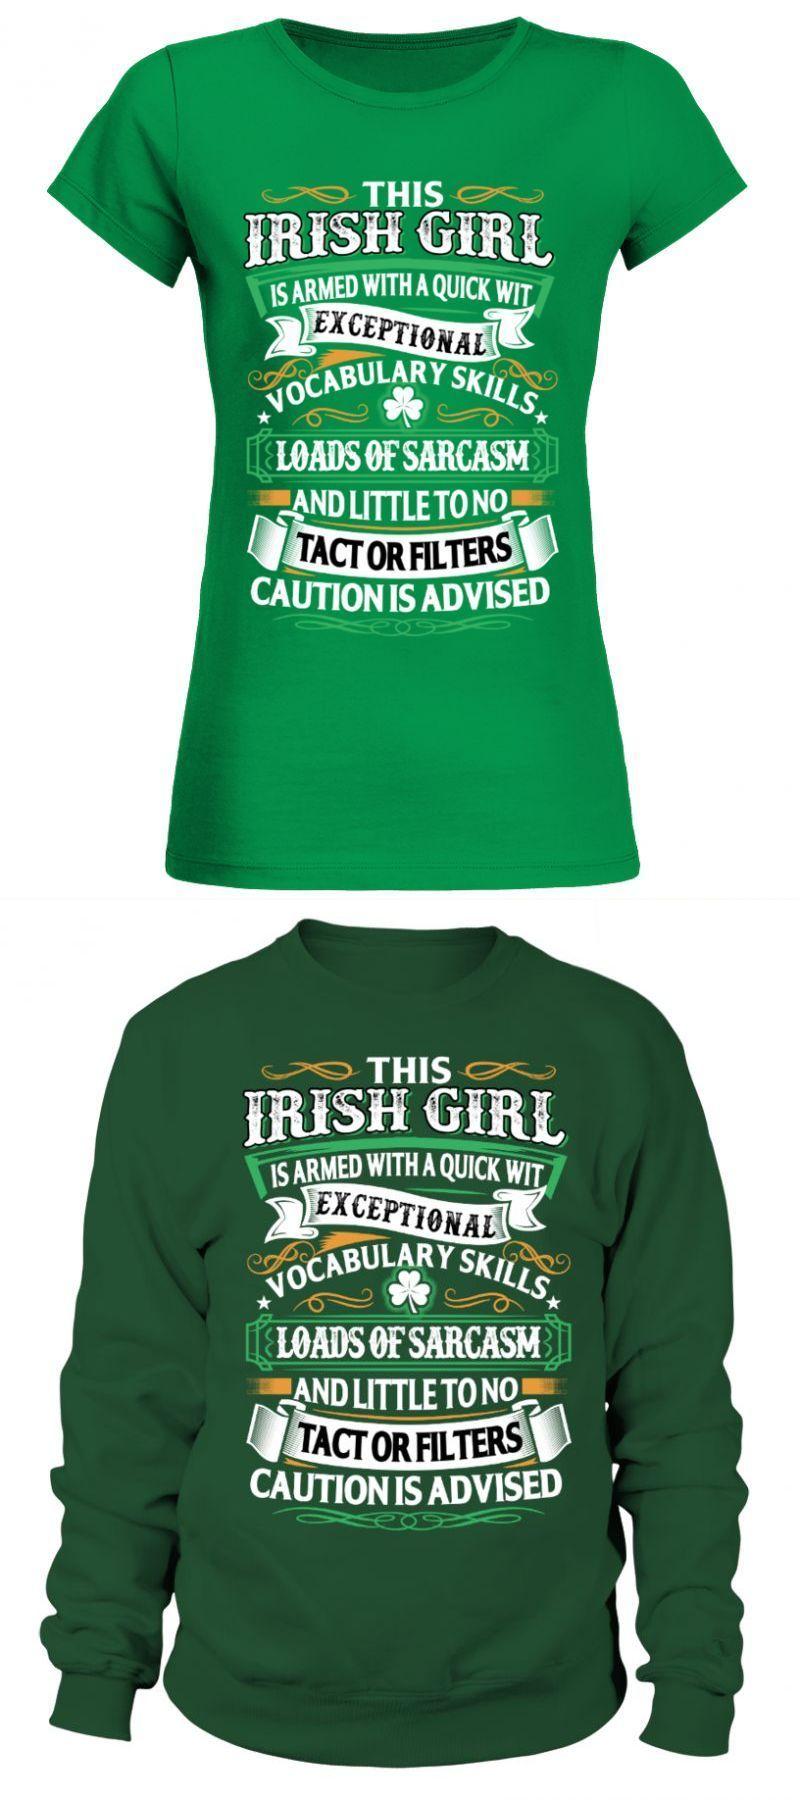 62e463ba St patrick's day t shirts irish - this irish girl st patrick's day t shirt  women's #st #patrick's #day #shirts #irish #this #girl #shirt #women's #uk  #round ...